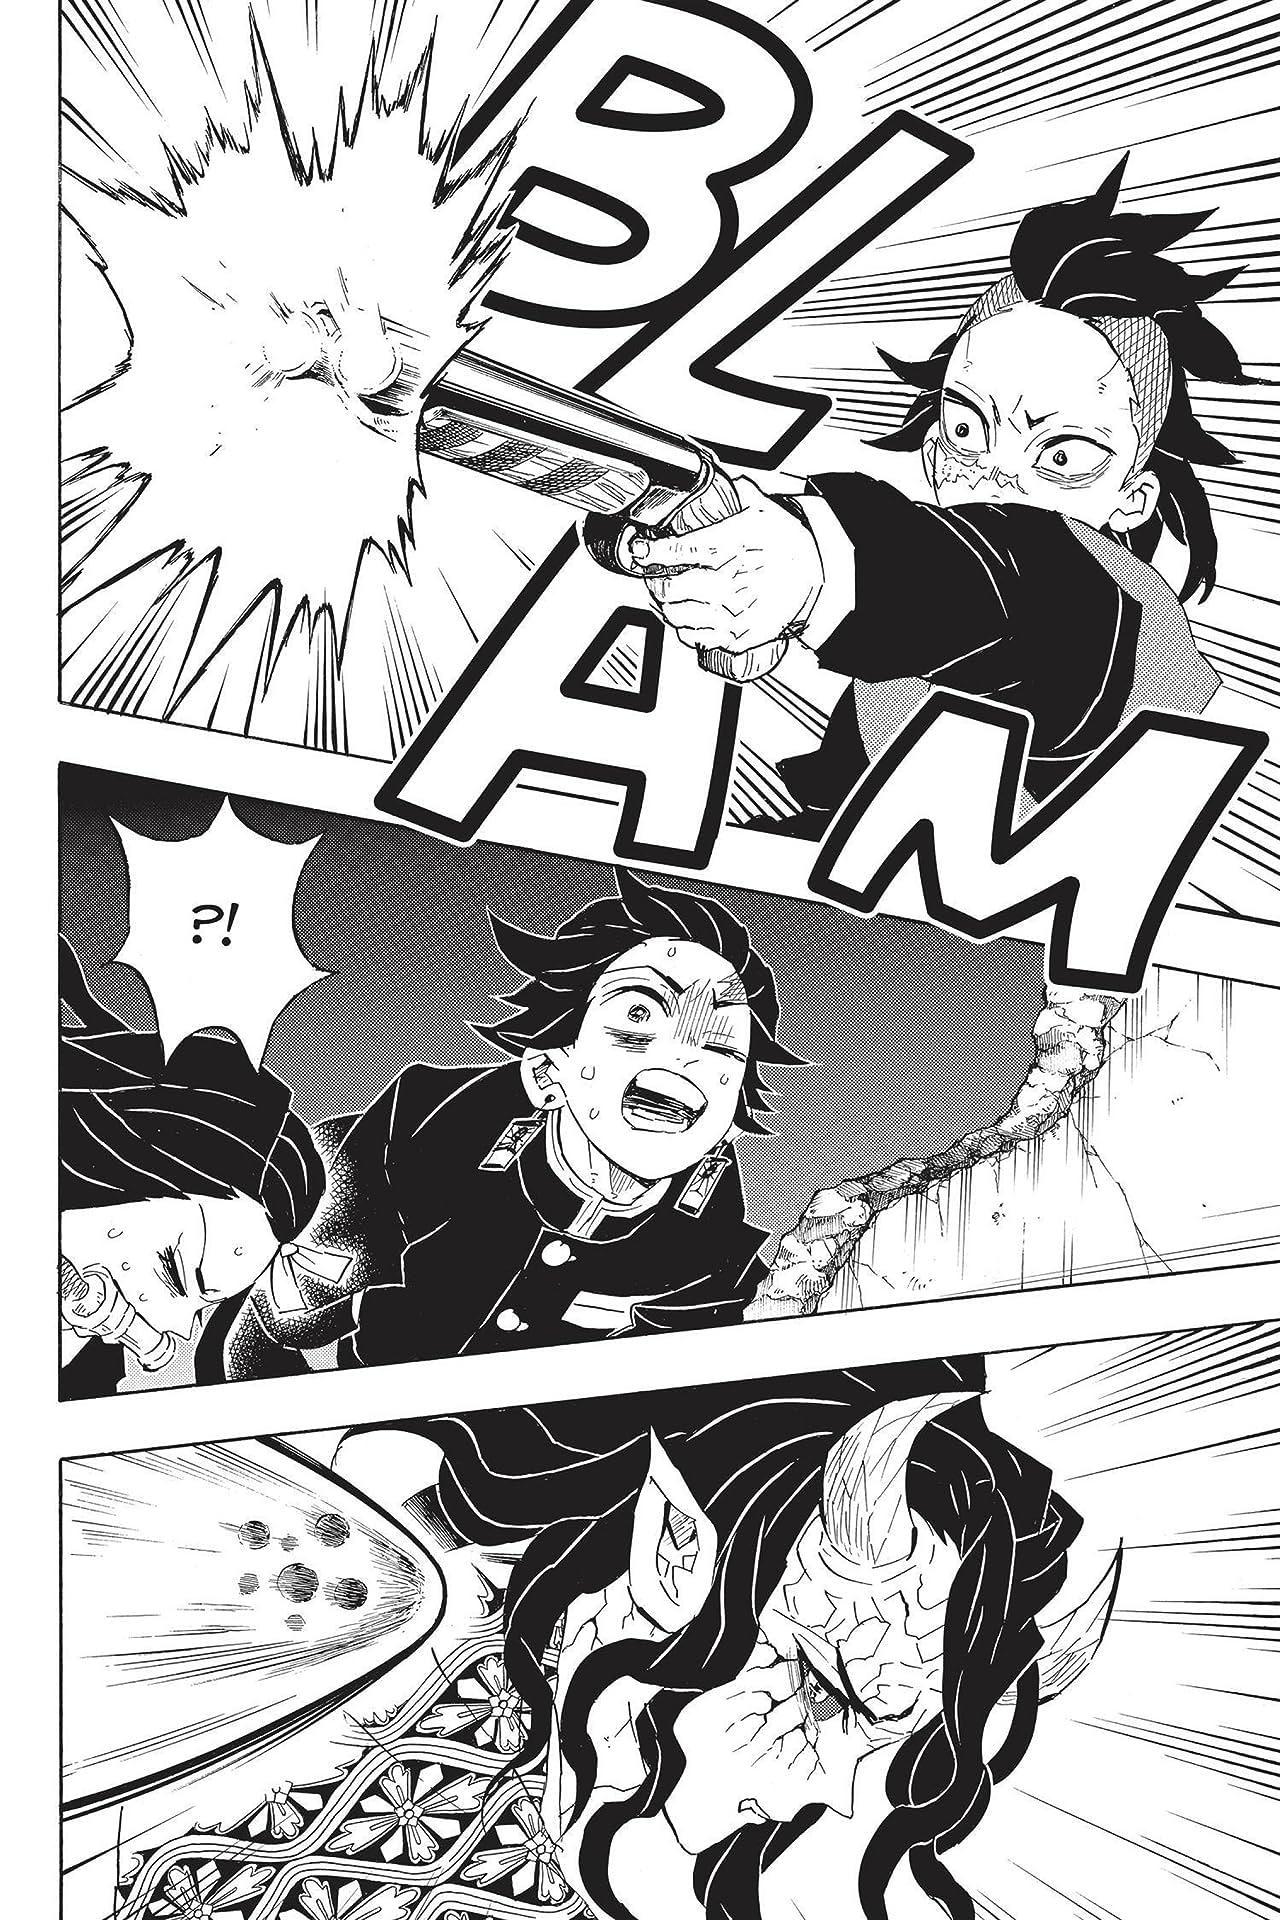 Demon Slayer: Kimetsu no Yaiba Vol. 13: Transitions